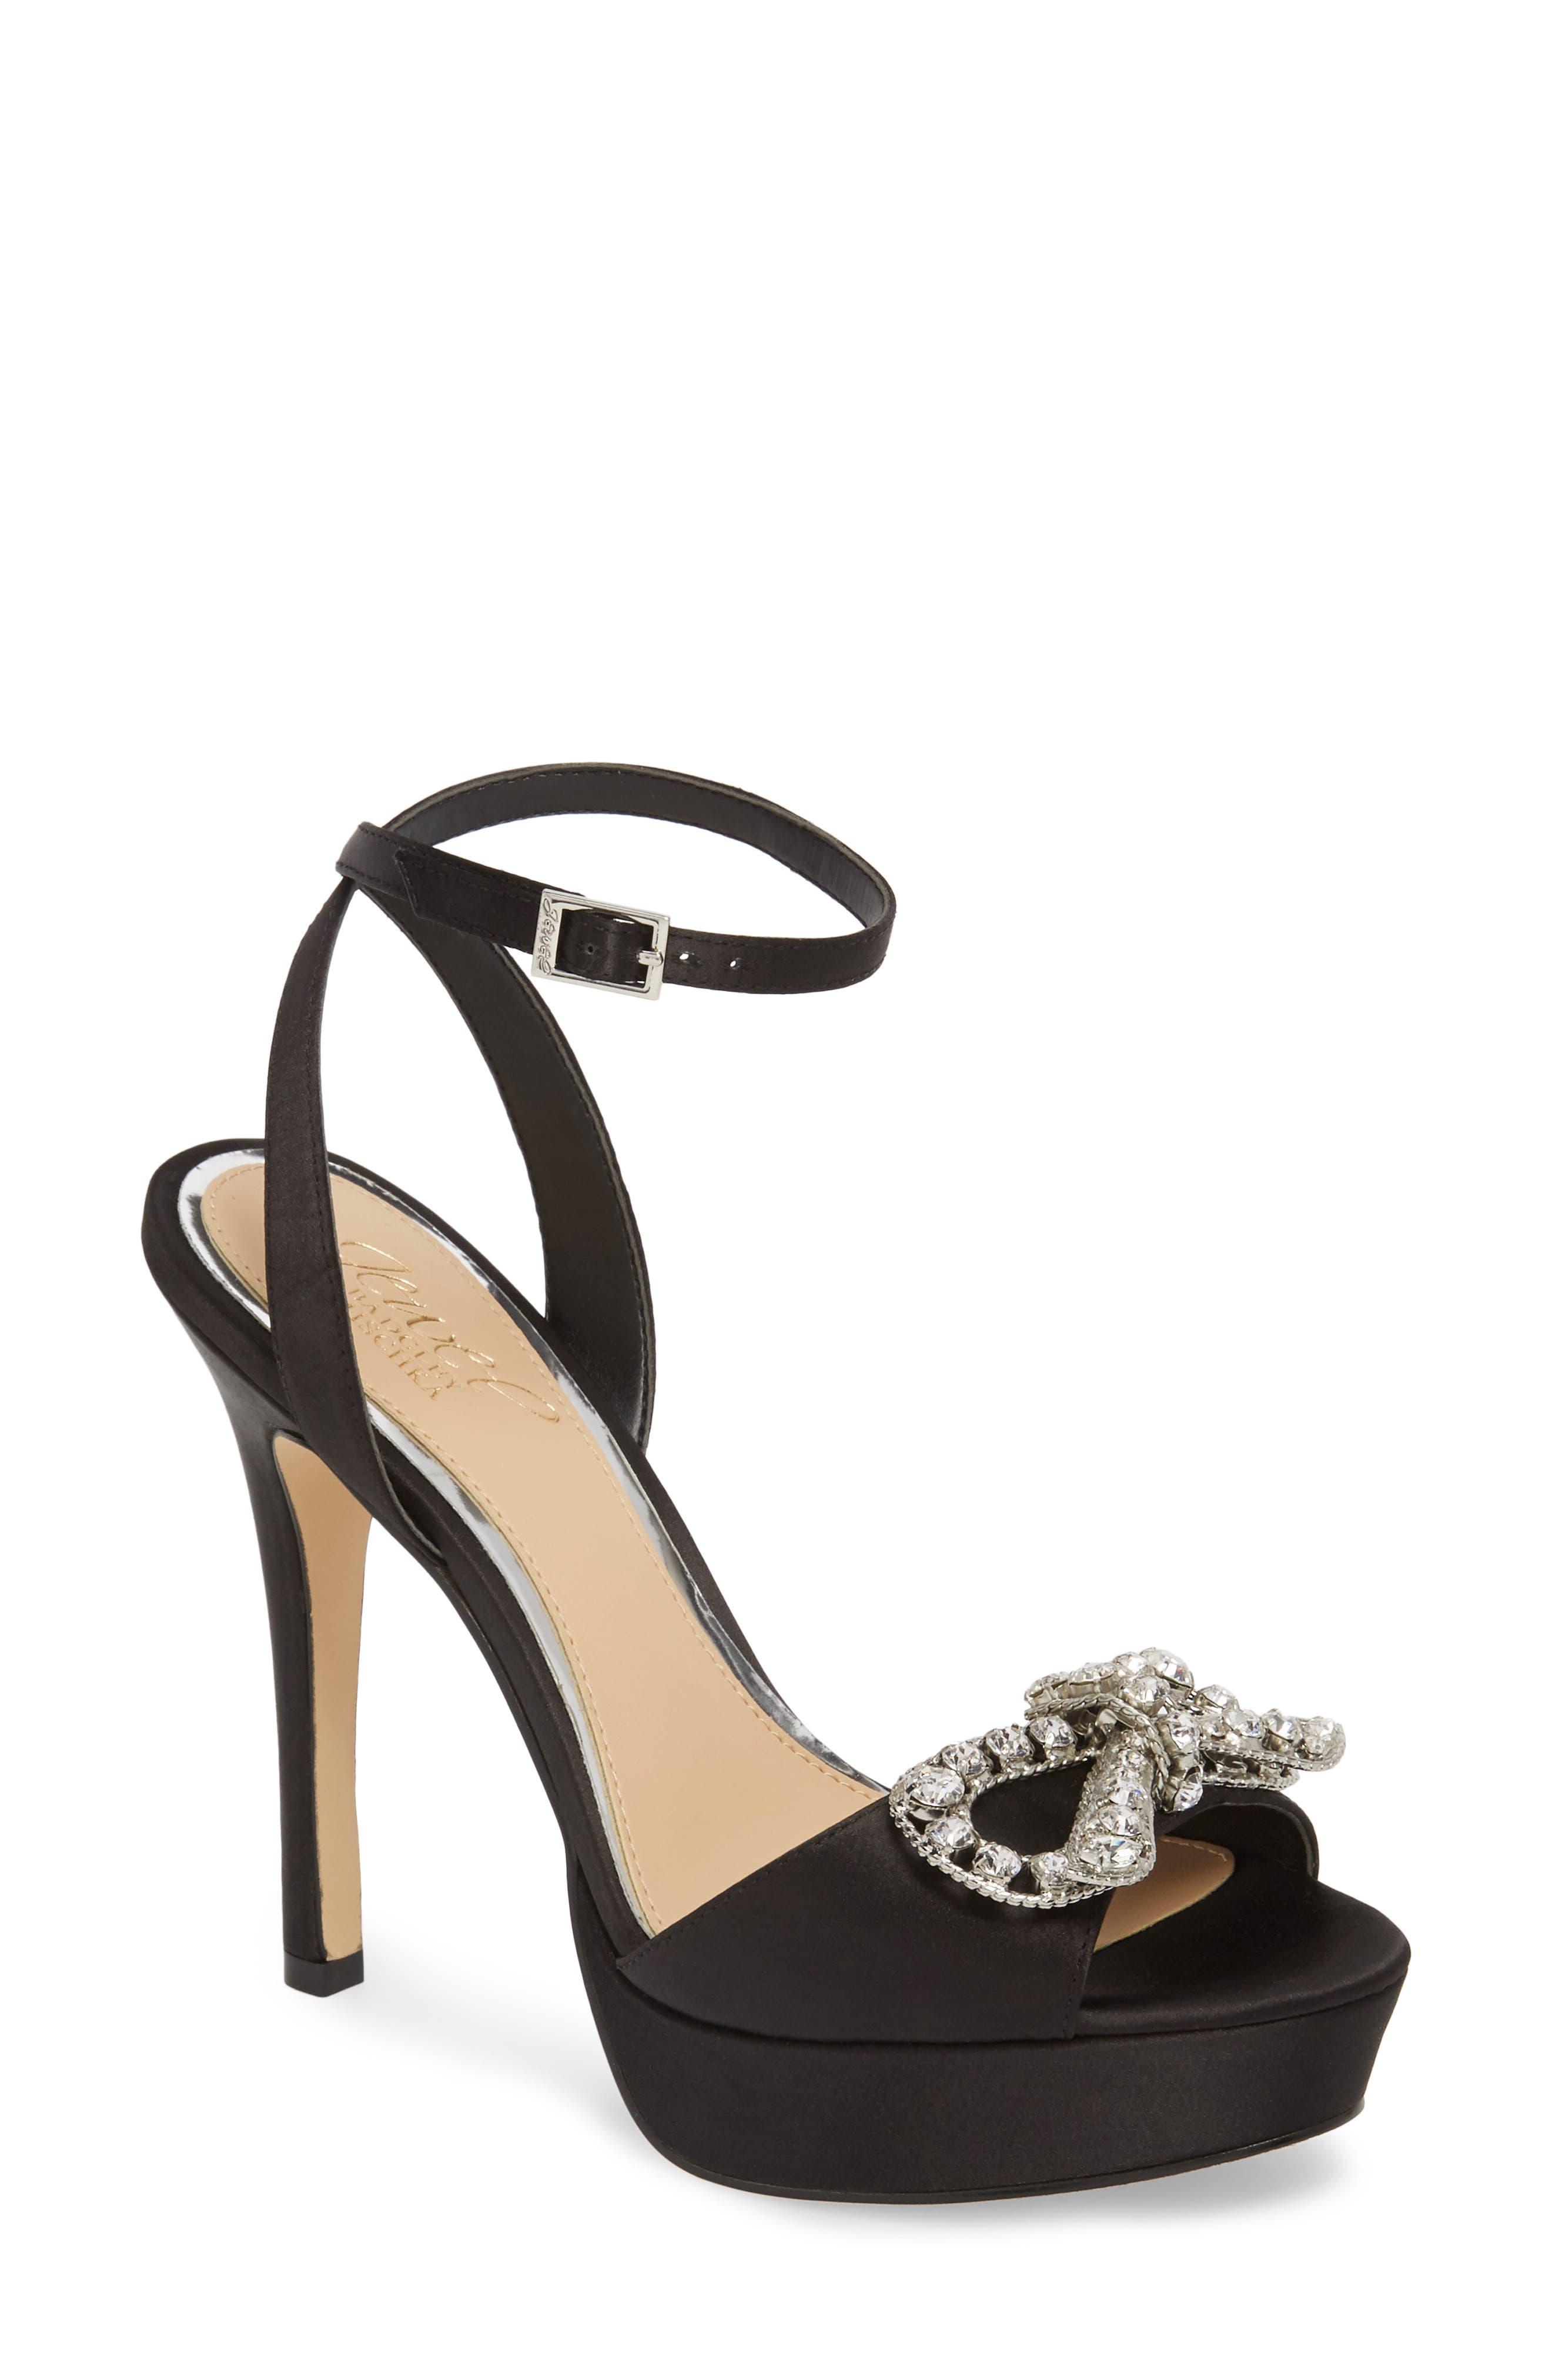 Mildred Crystal Bow Platform Sandal,                             Main thumbnail 1, color,                             015